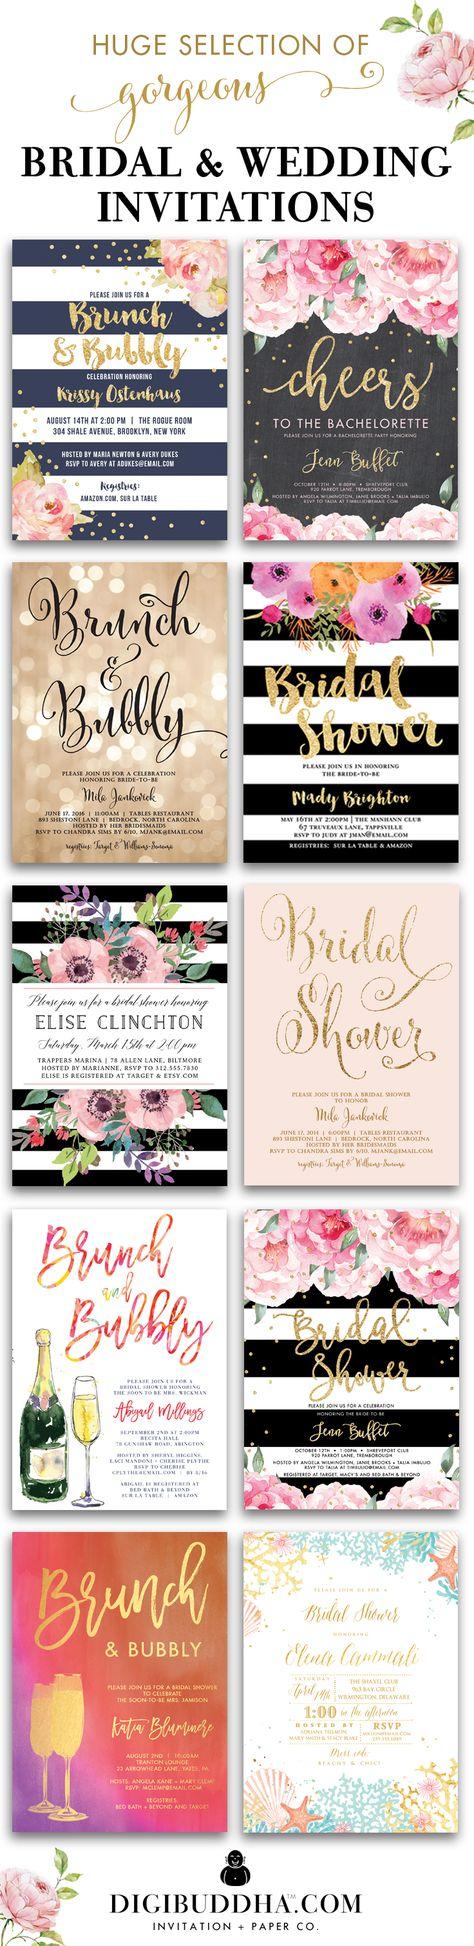 7 Luscious Tropical Bridal Shower Invitations